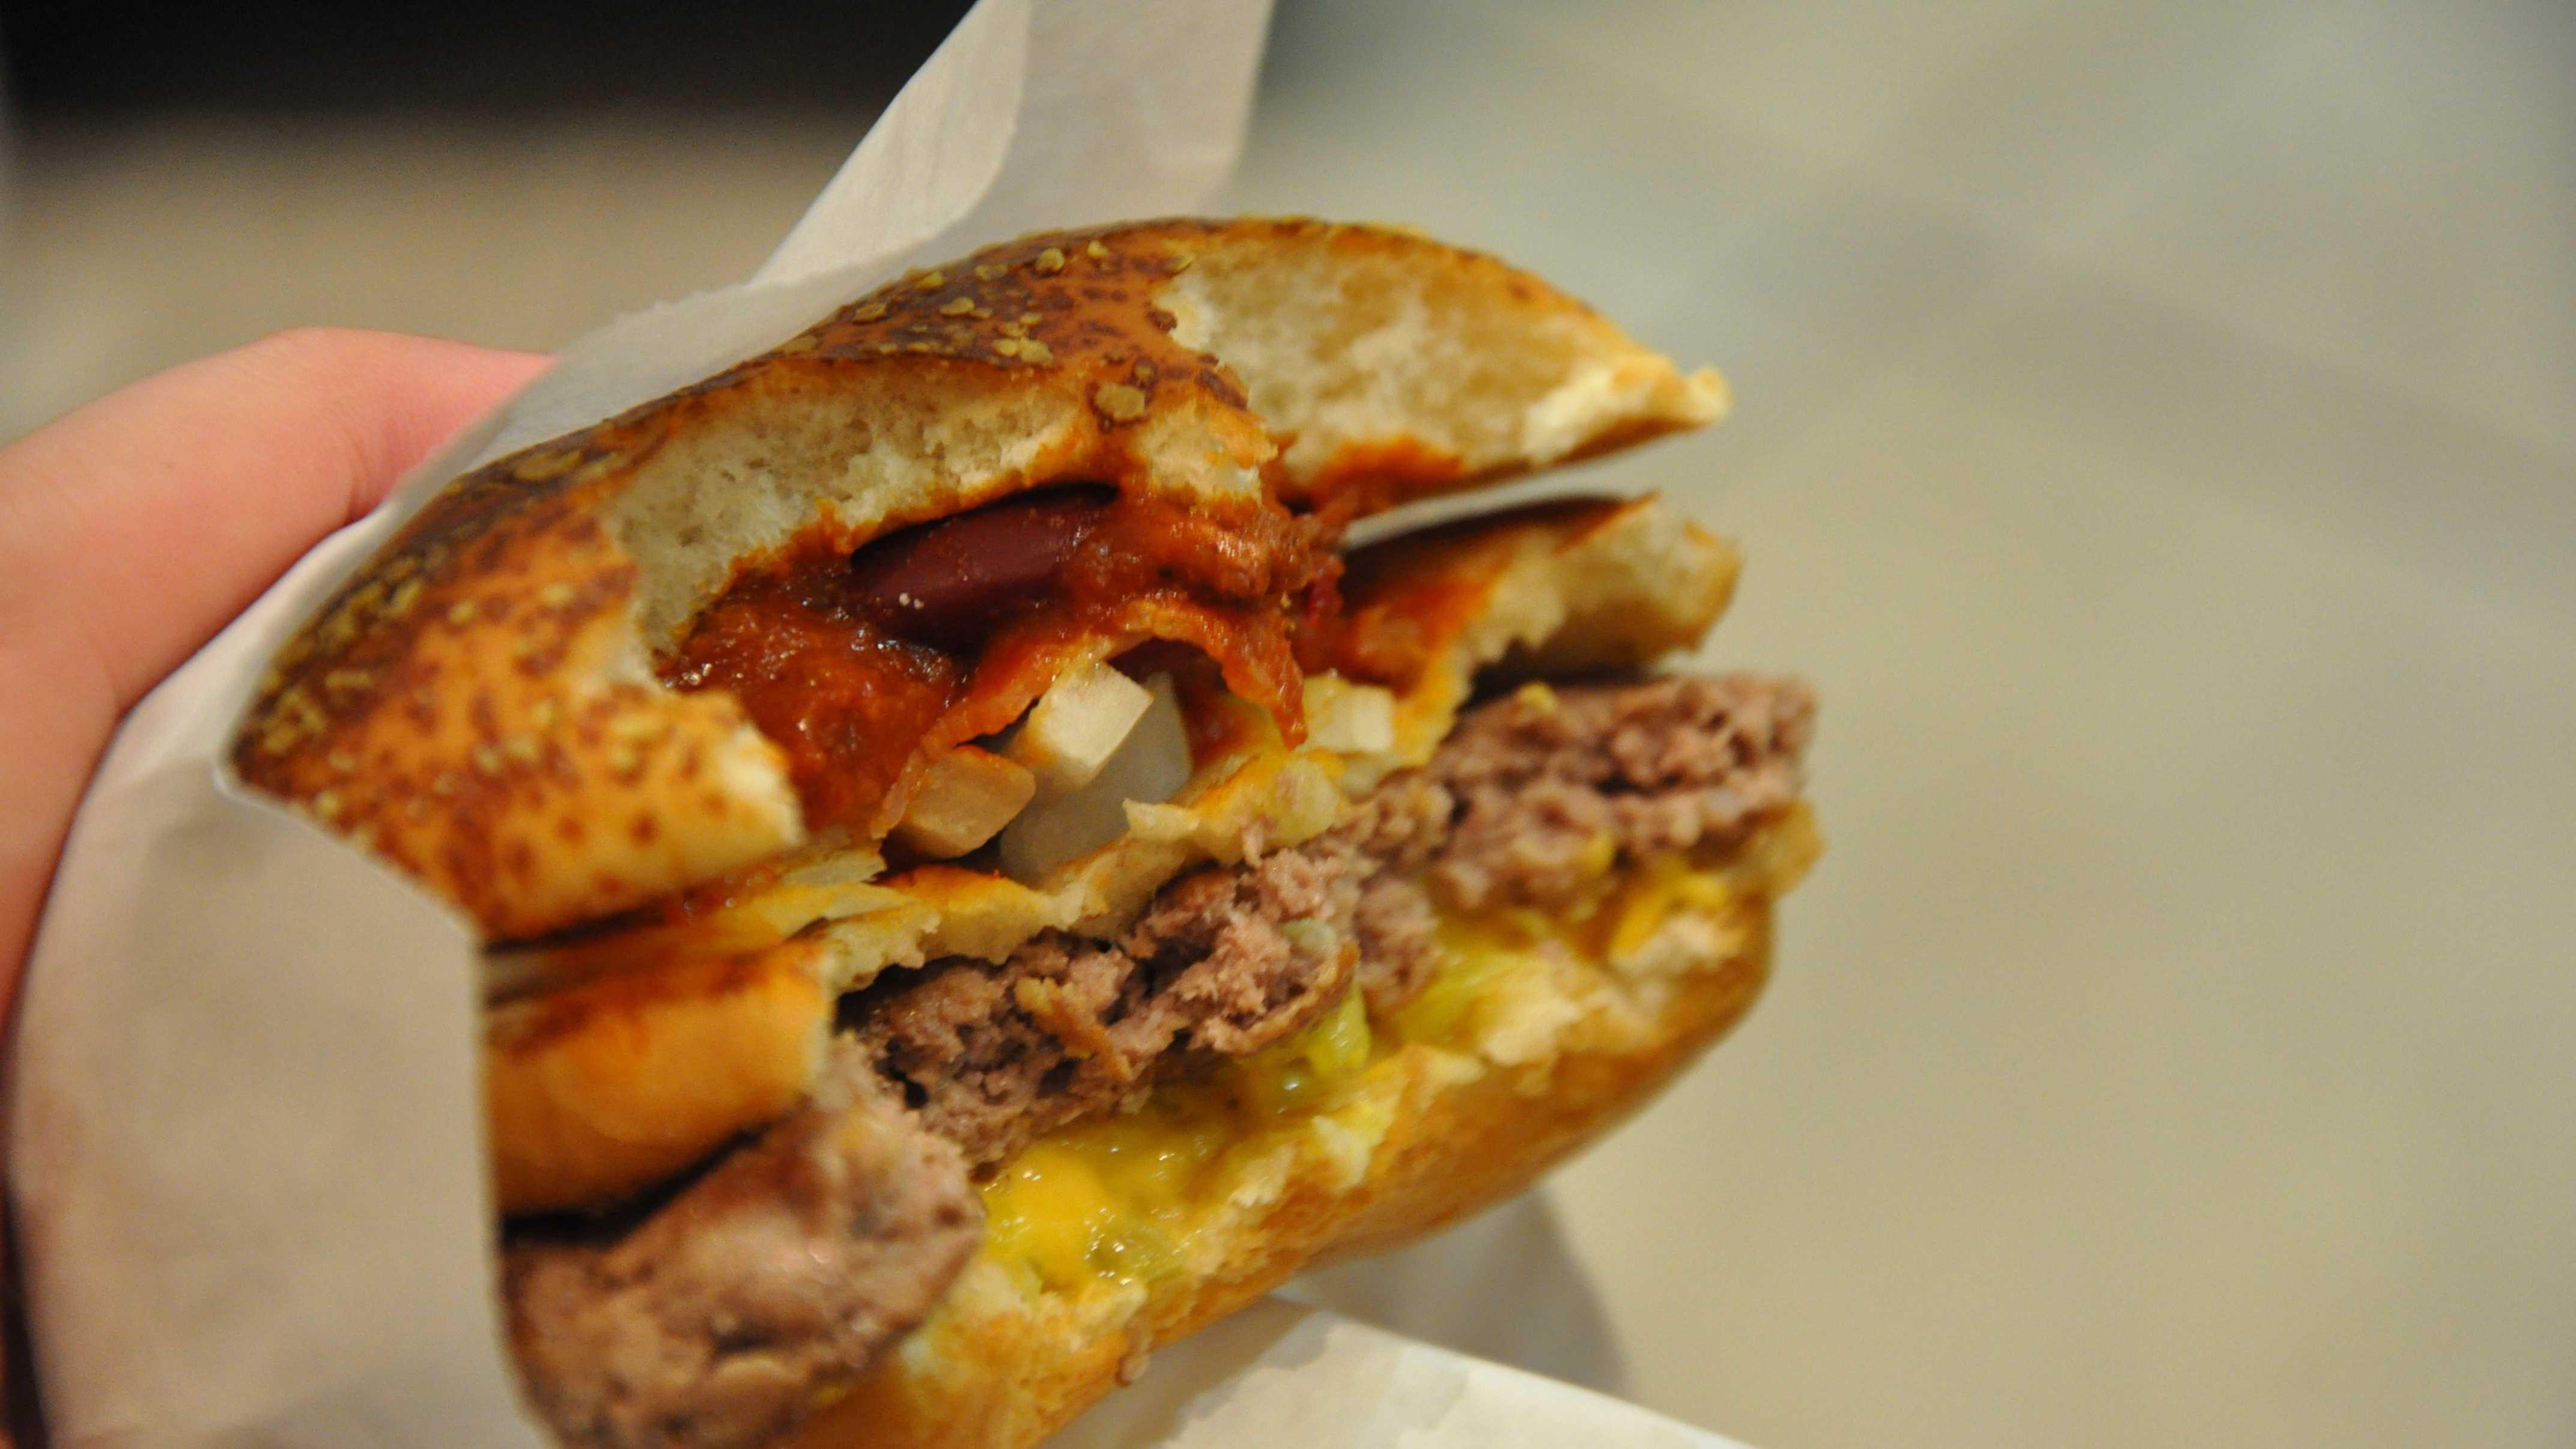 McDonalds hamburger 051313.jpg